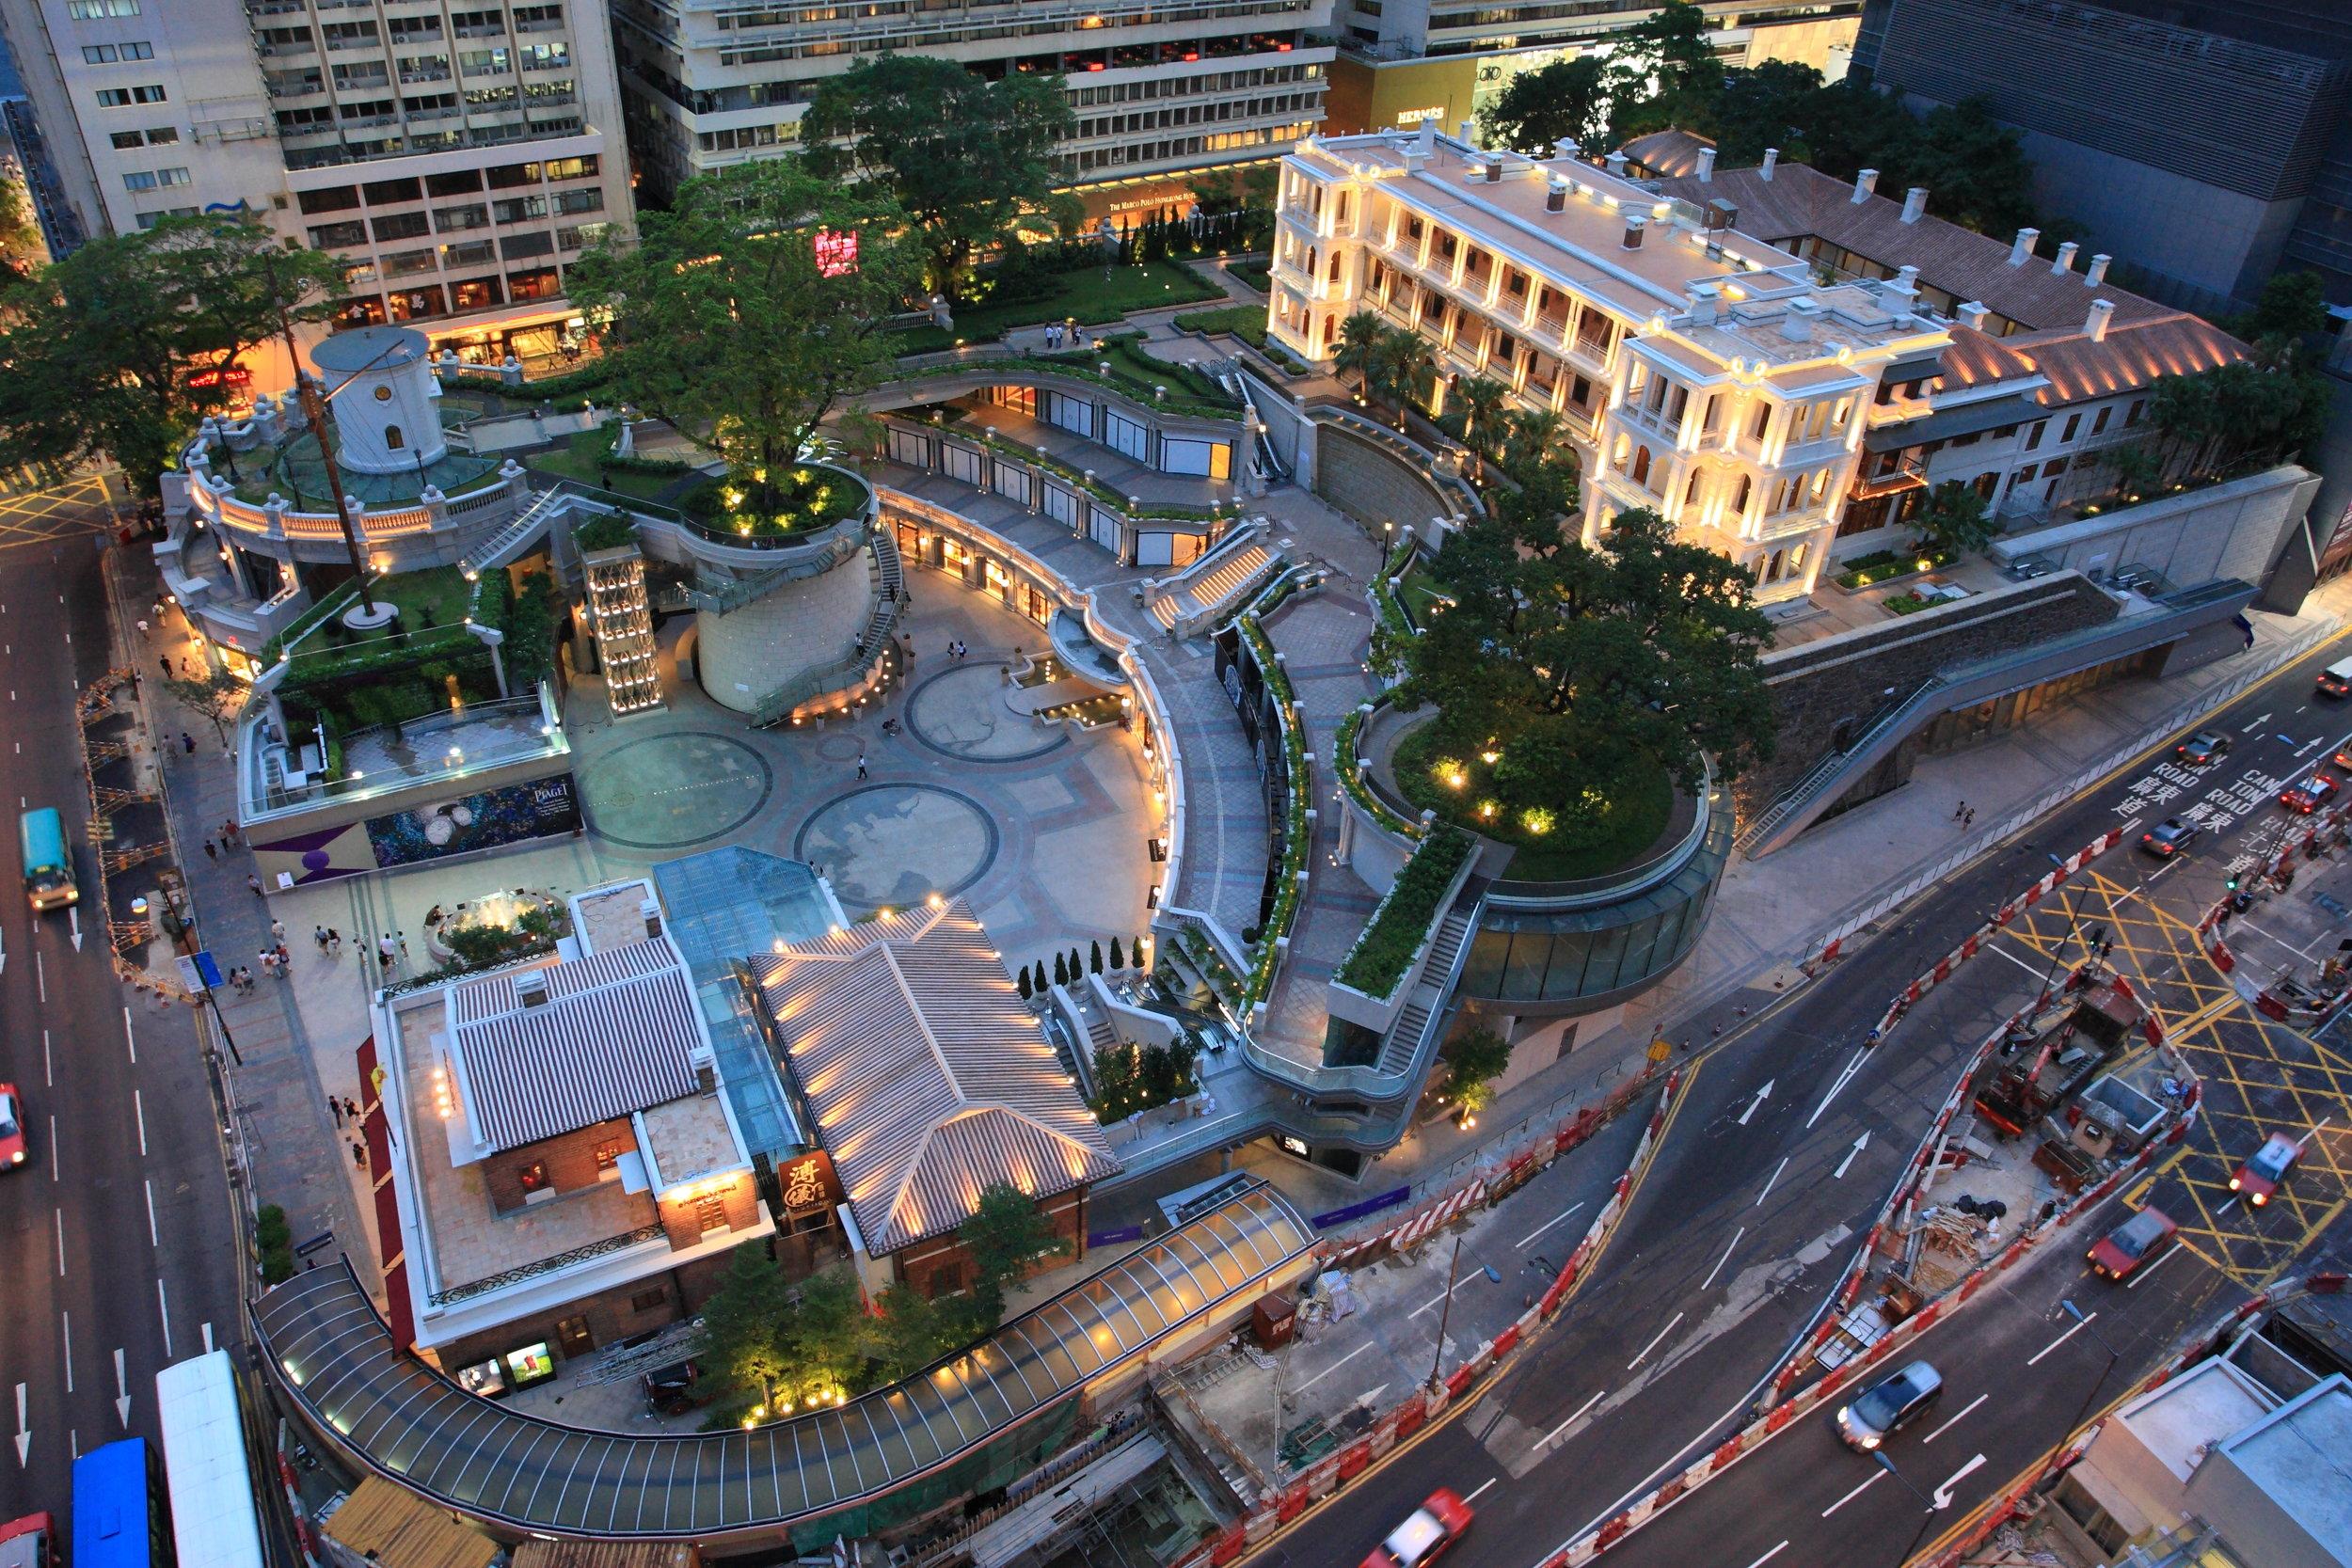 1881 HERITAGE, TSIM SHA TSUI, HONG KONG